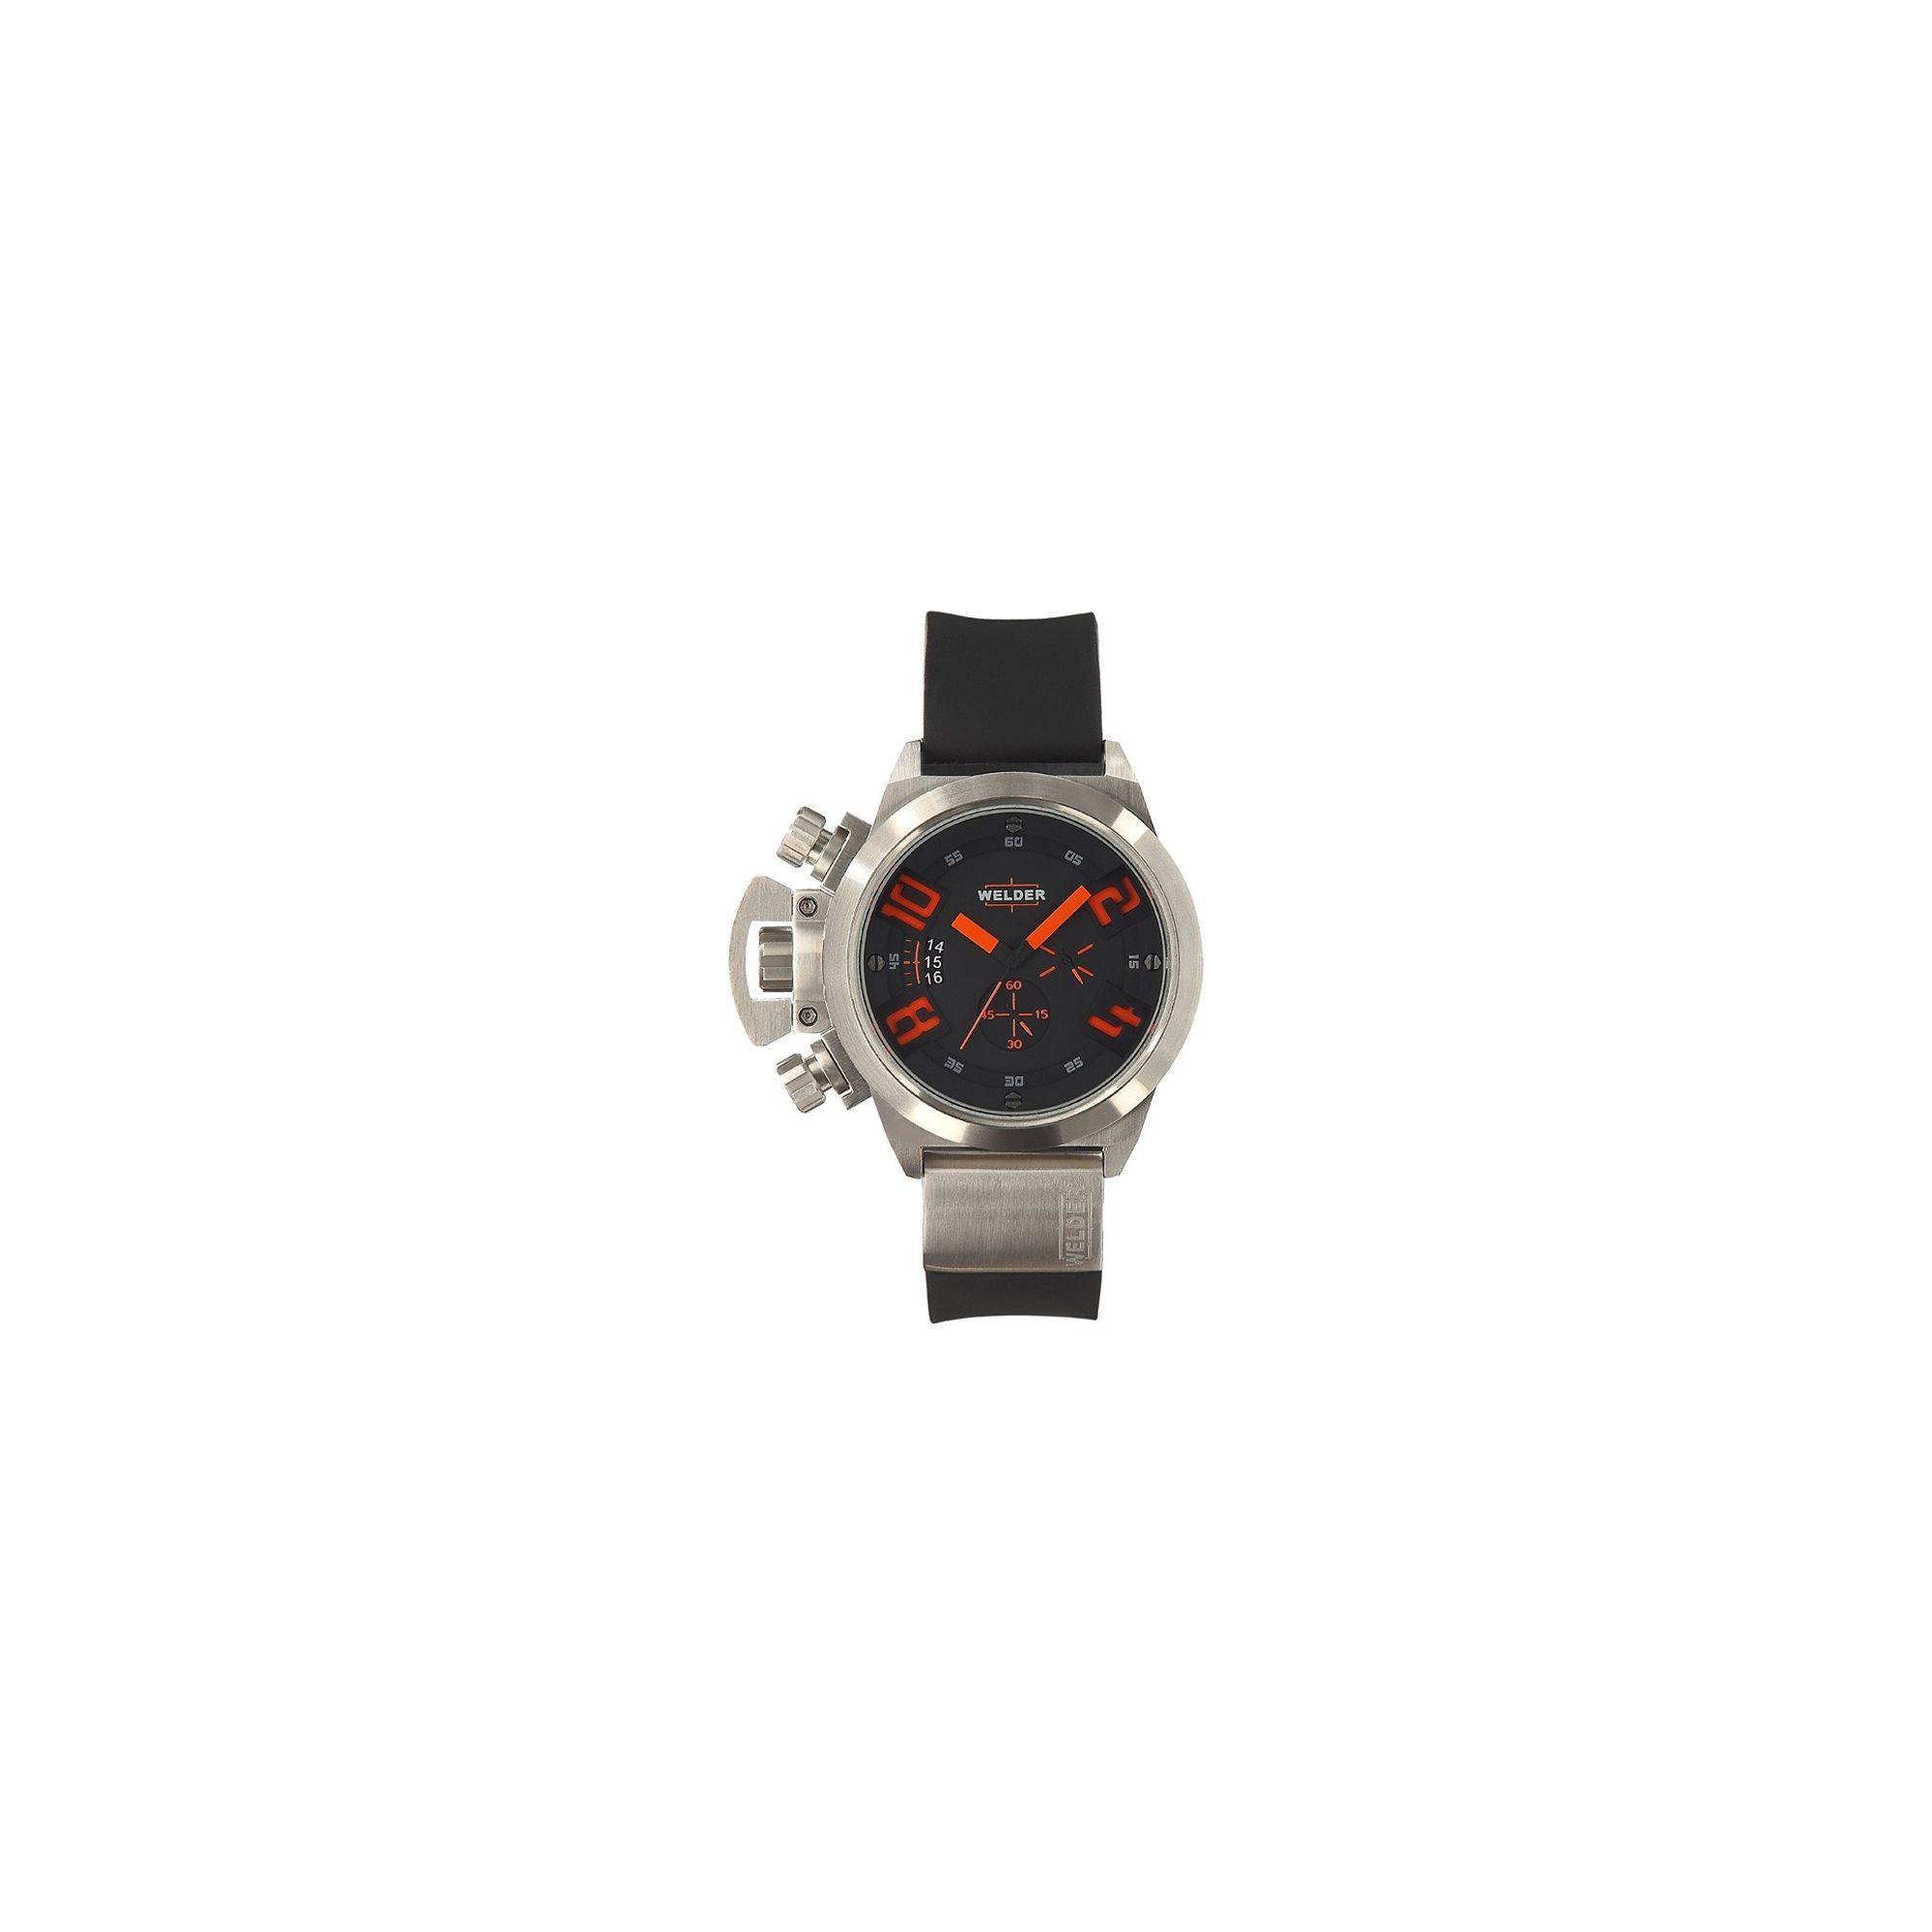 Welder Gents Black Dial Black Rubber Strap Watch K24-3201 at Tesco Direct